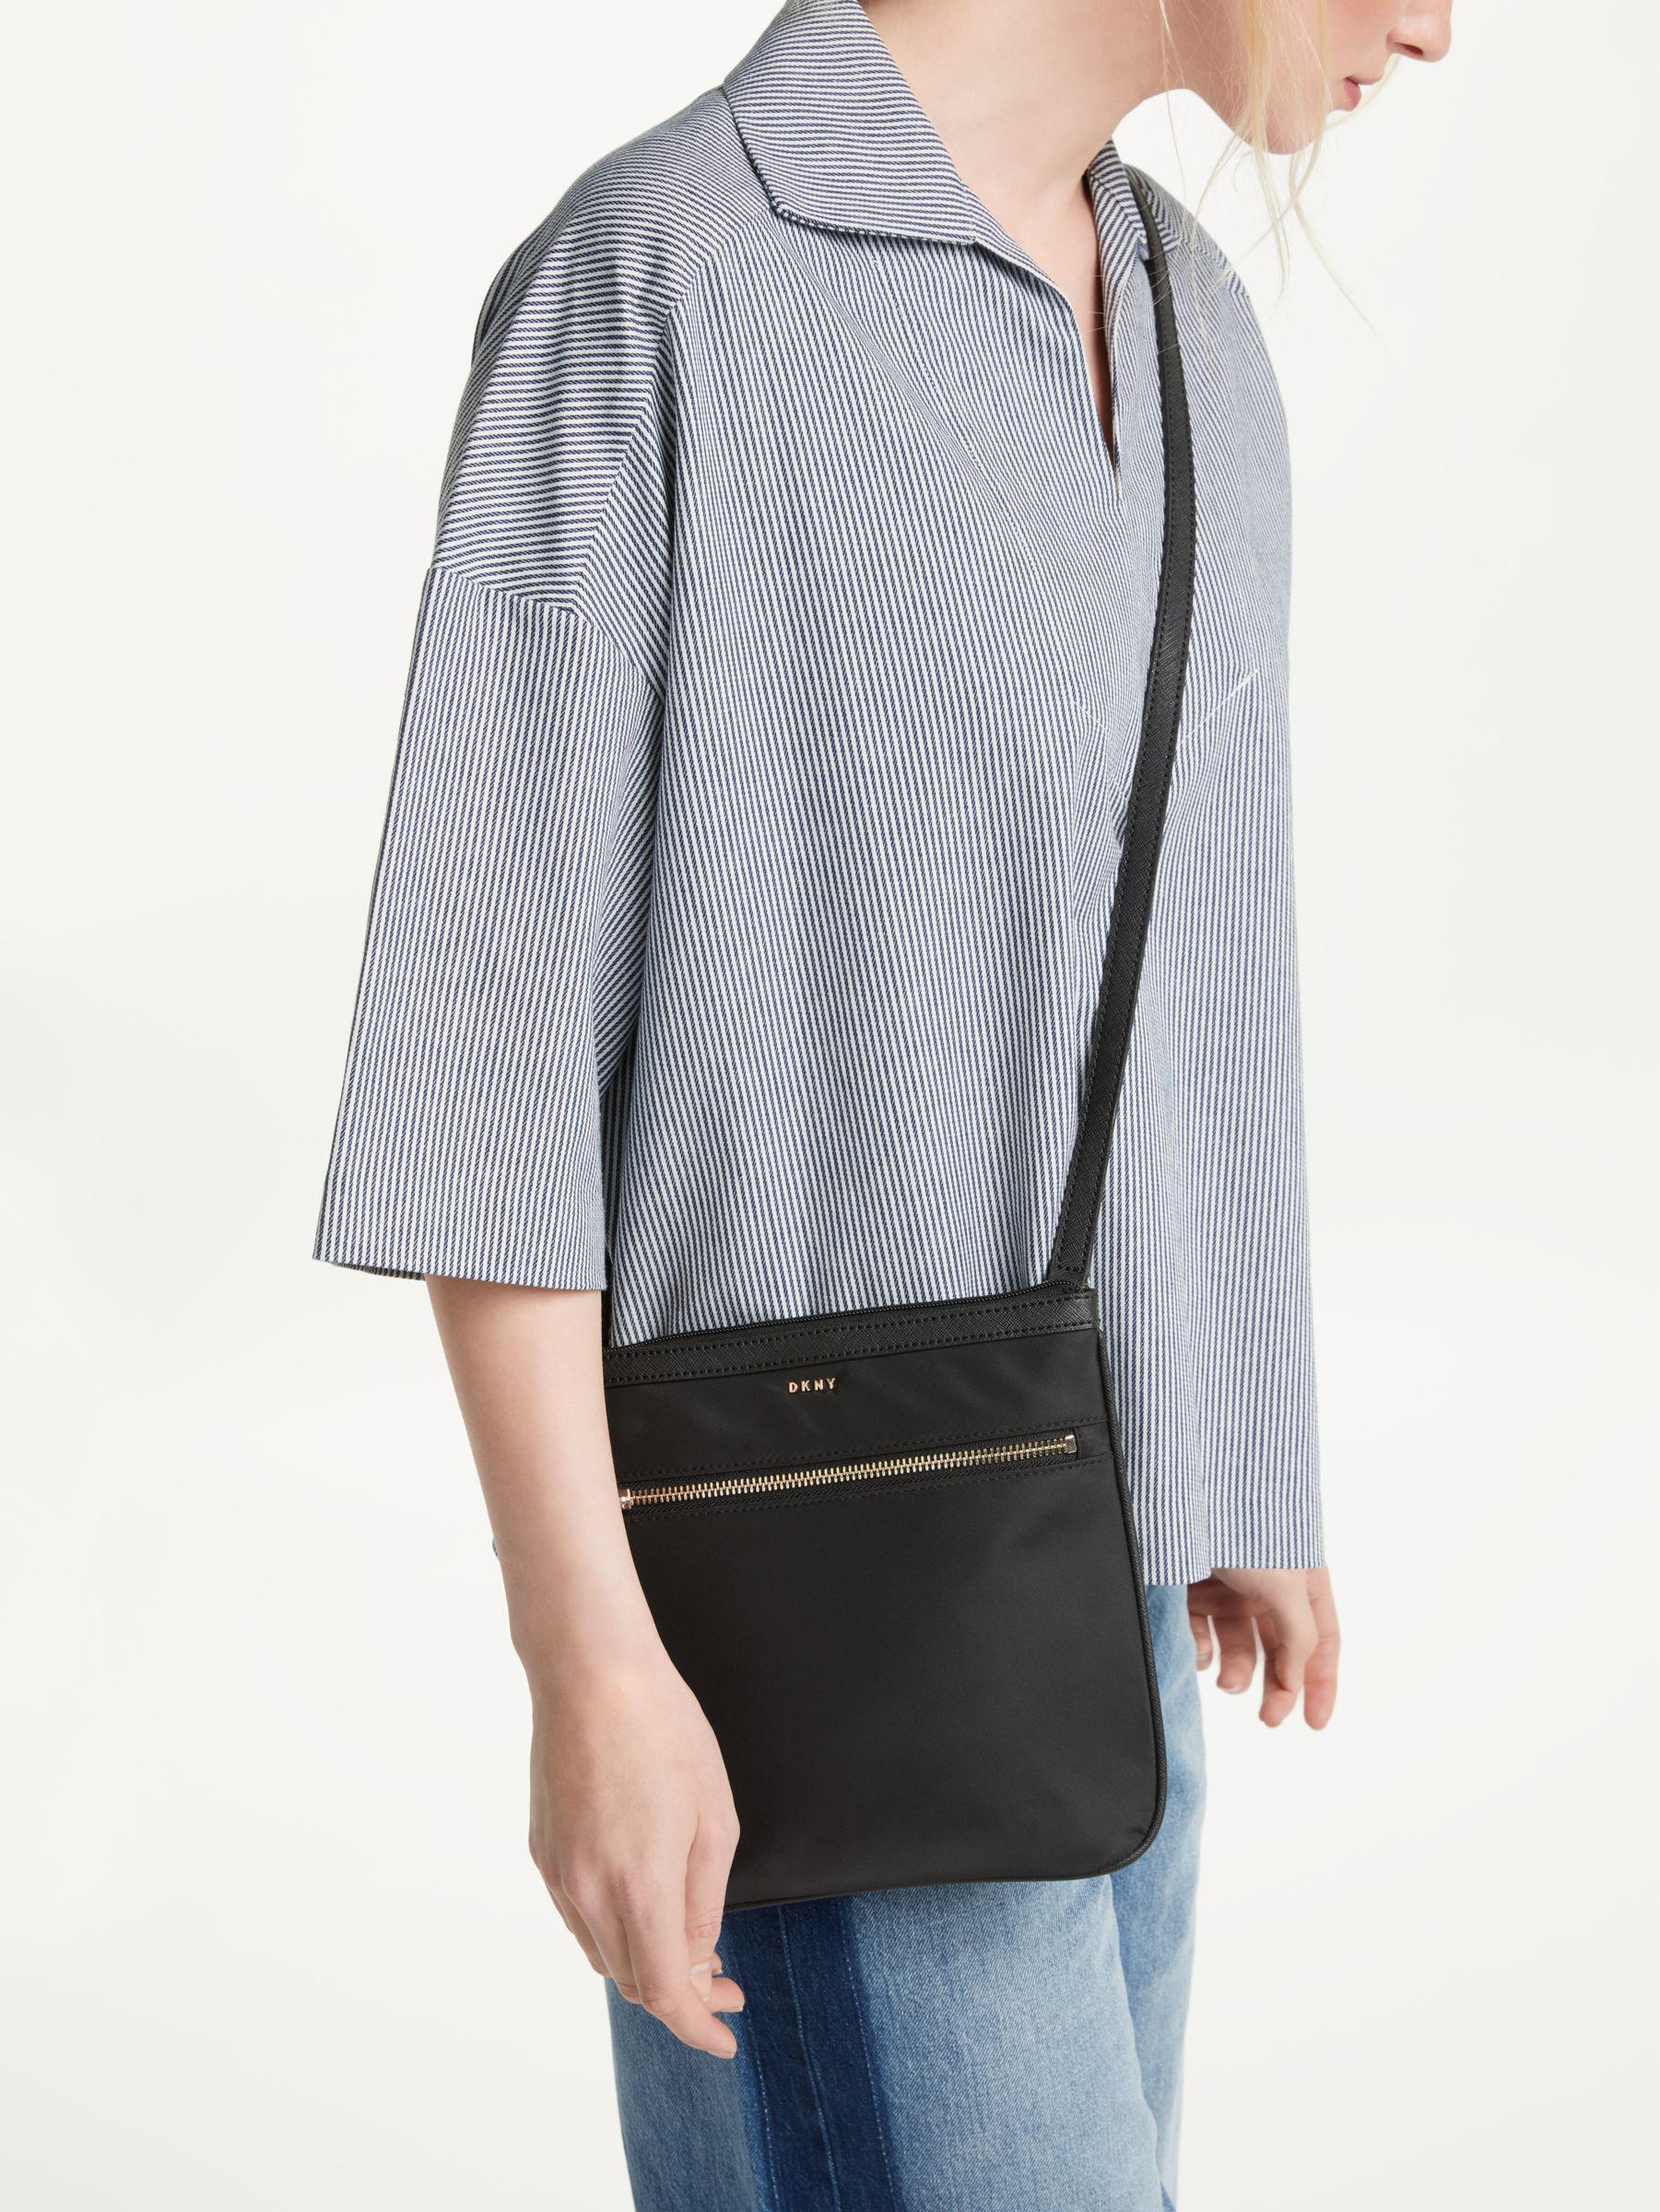 DKNY Synthetic Kaden Medium Cross Body Bag in Black for Men